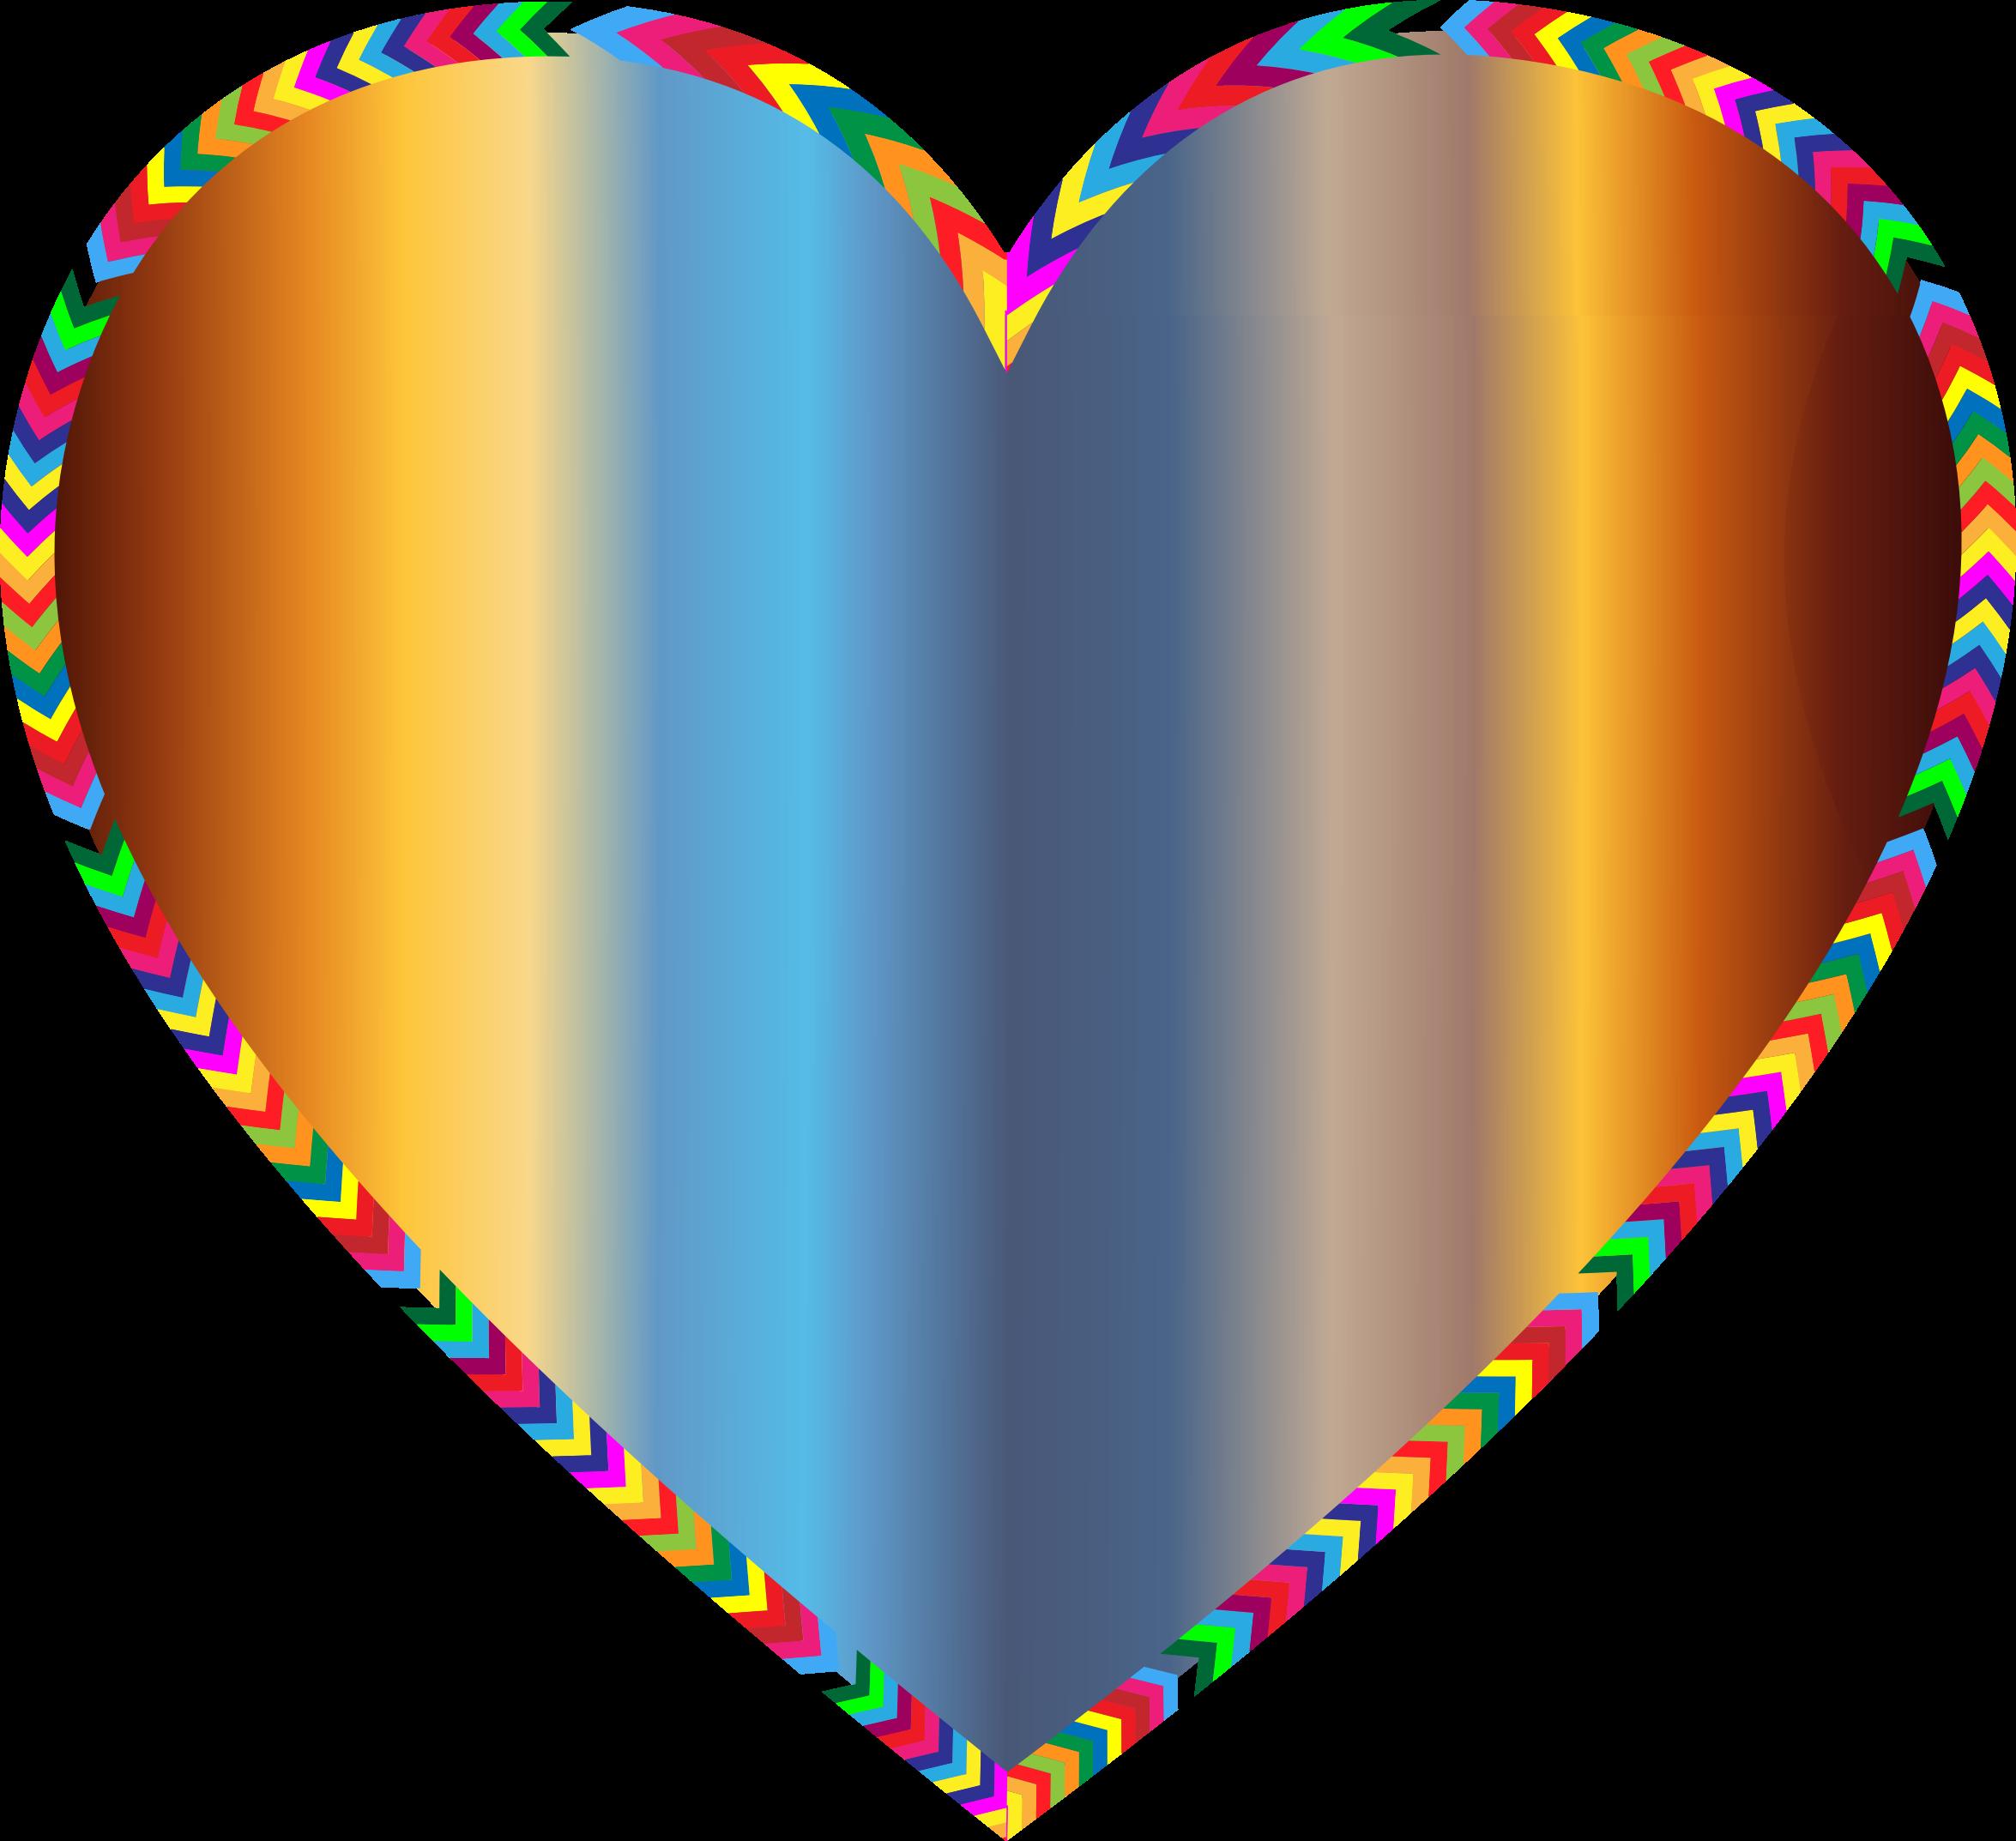 Glitter clipart love arrow. Multicolored arrows heart filled